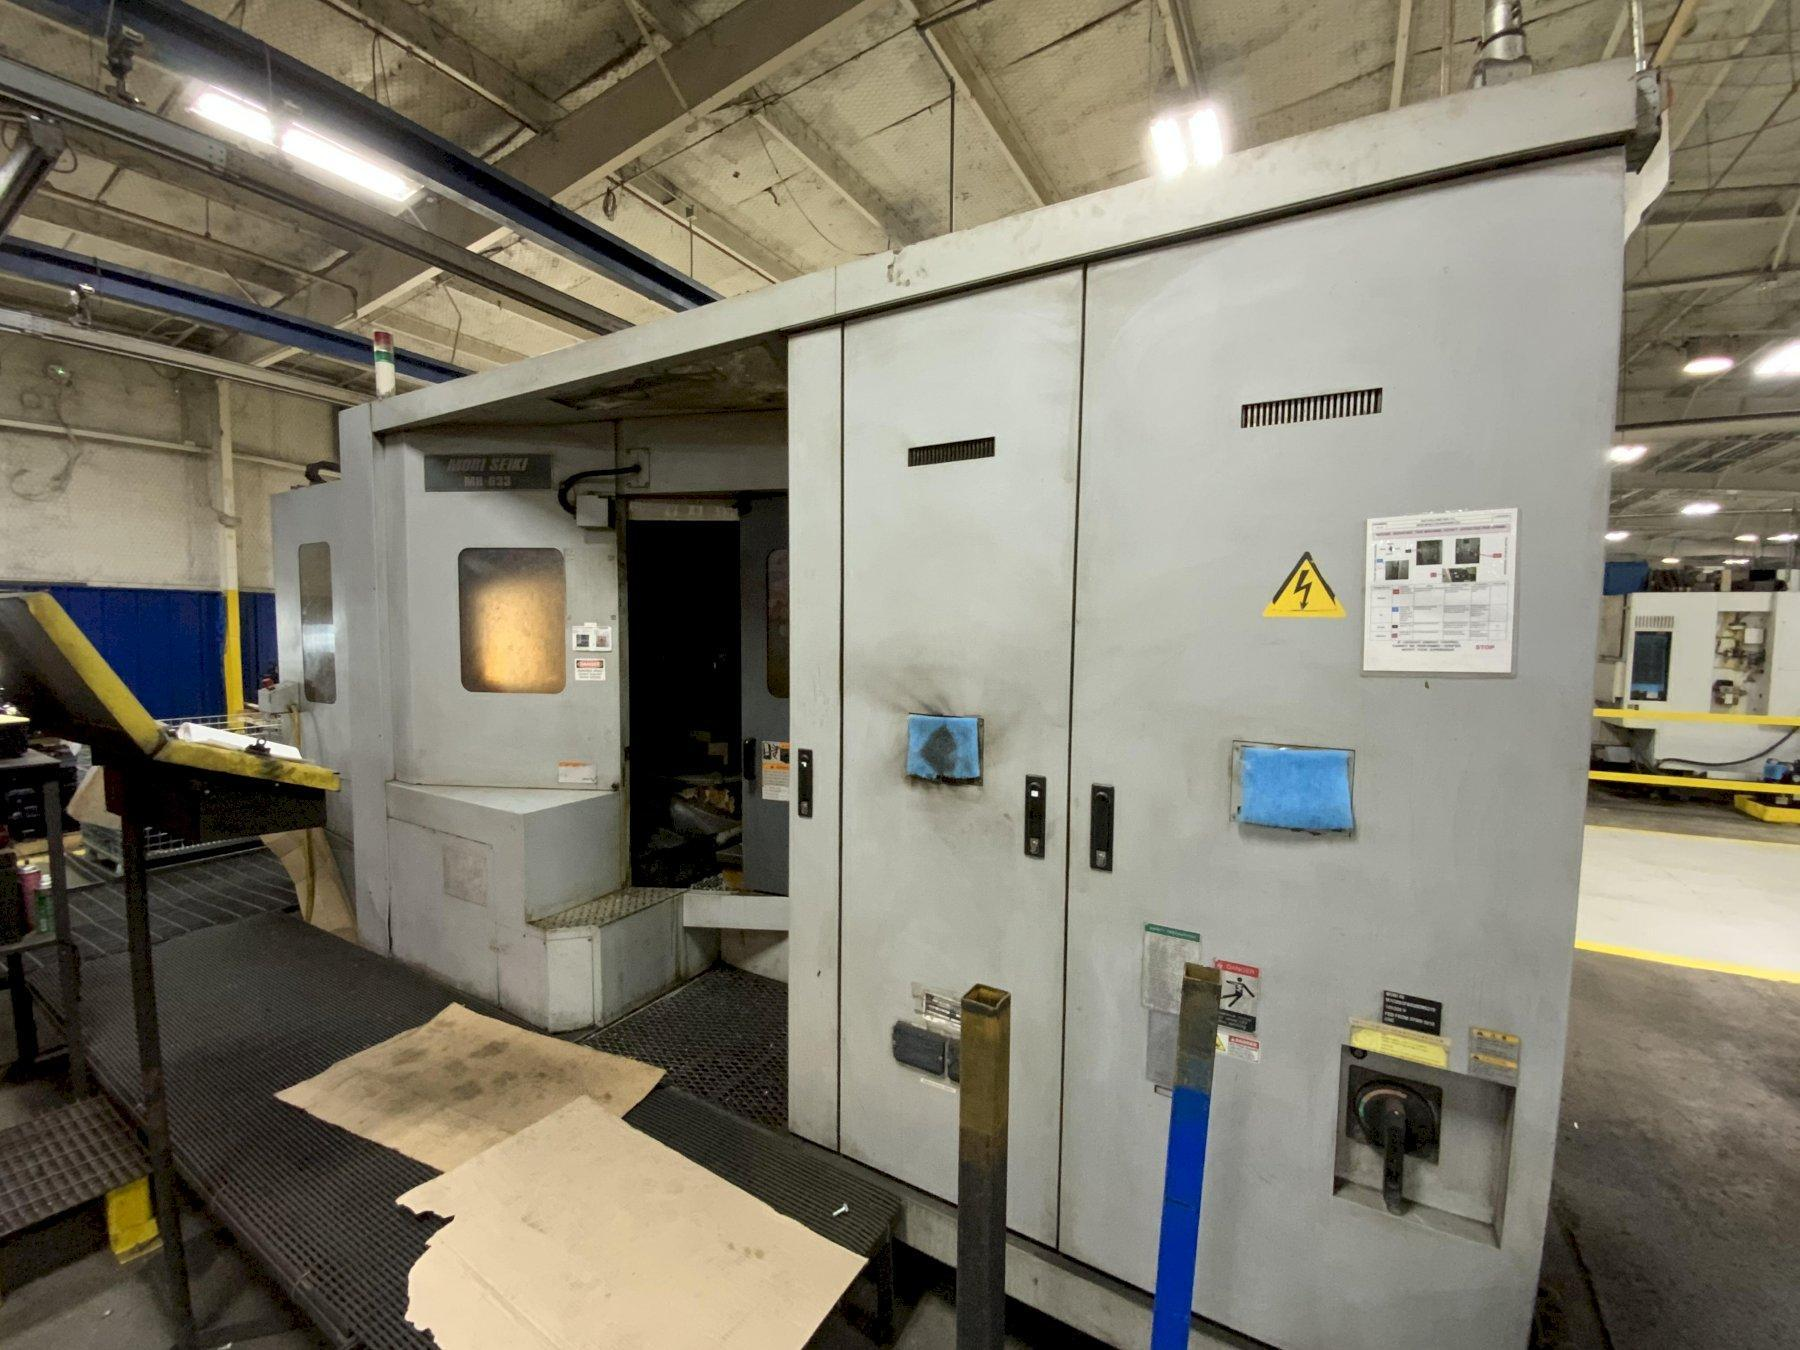 MORI SEIKI MH-633 HORIZONTAL MACHINING CENTER: STOCK #14641